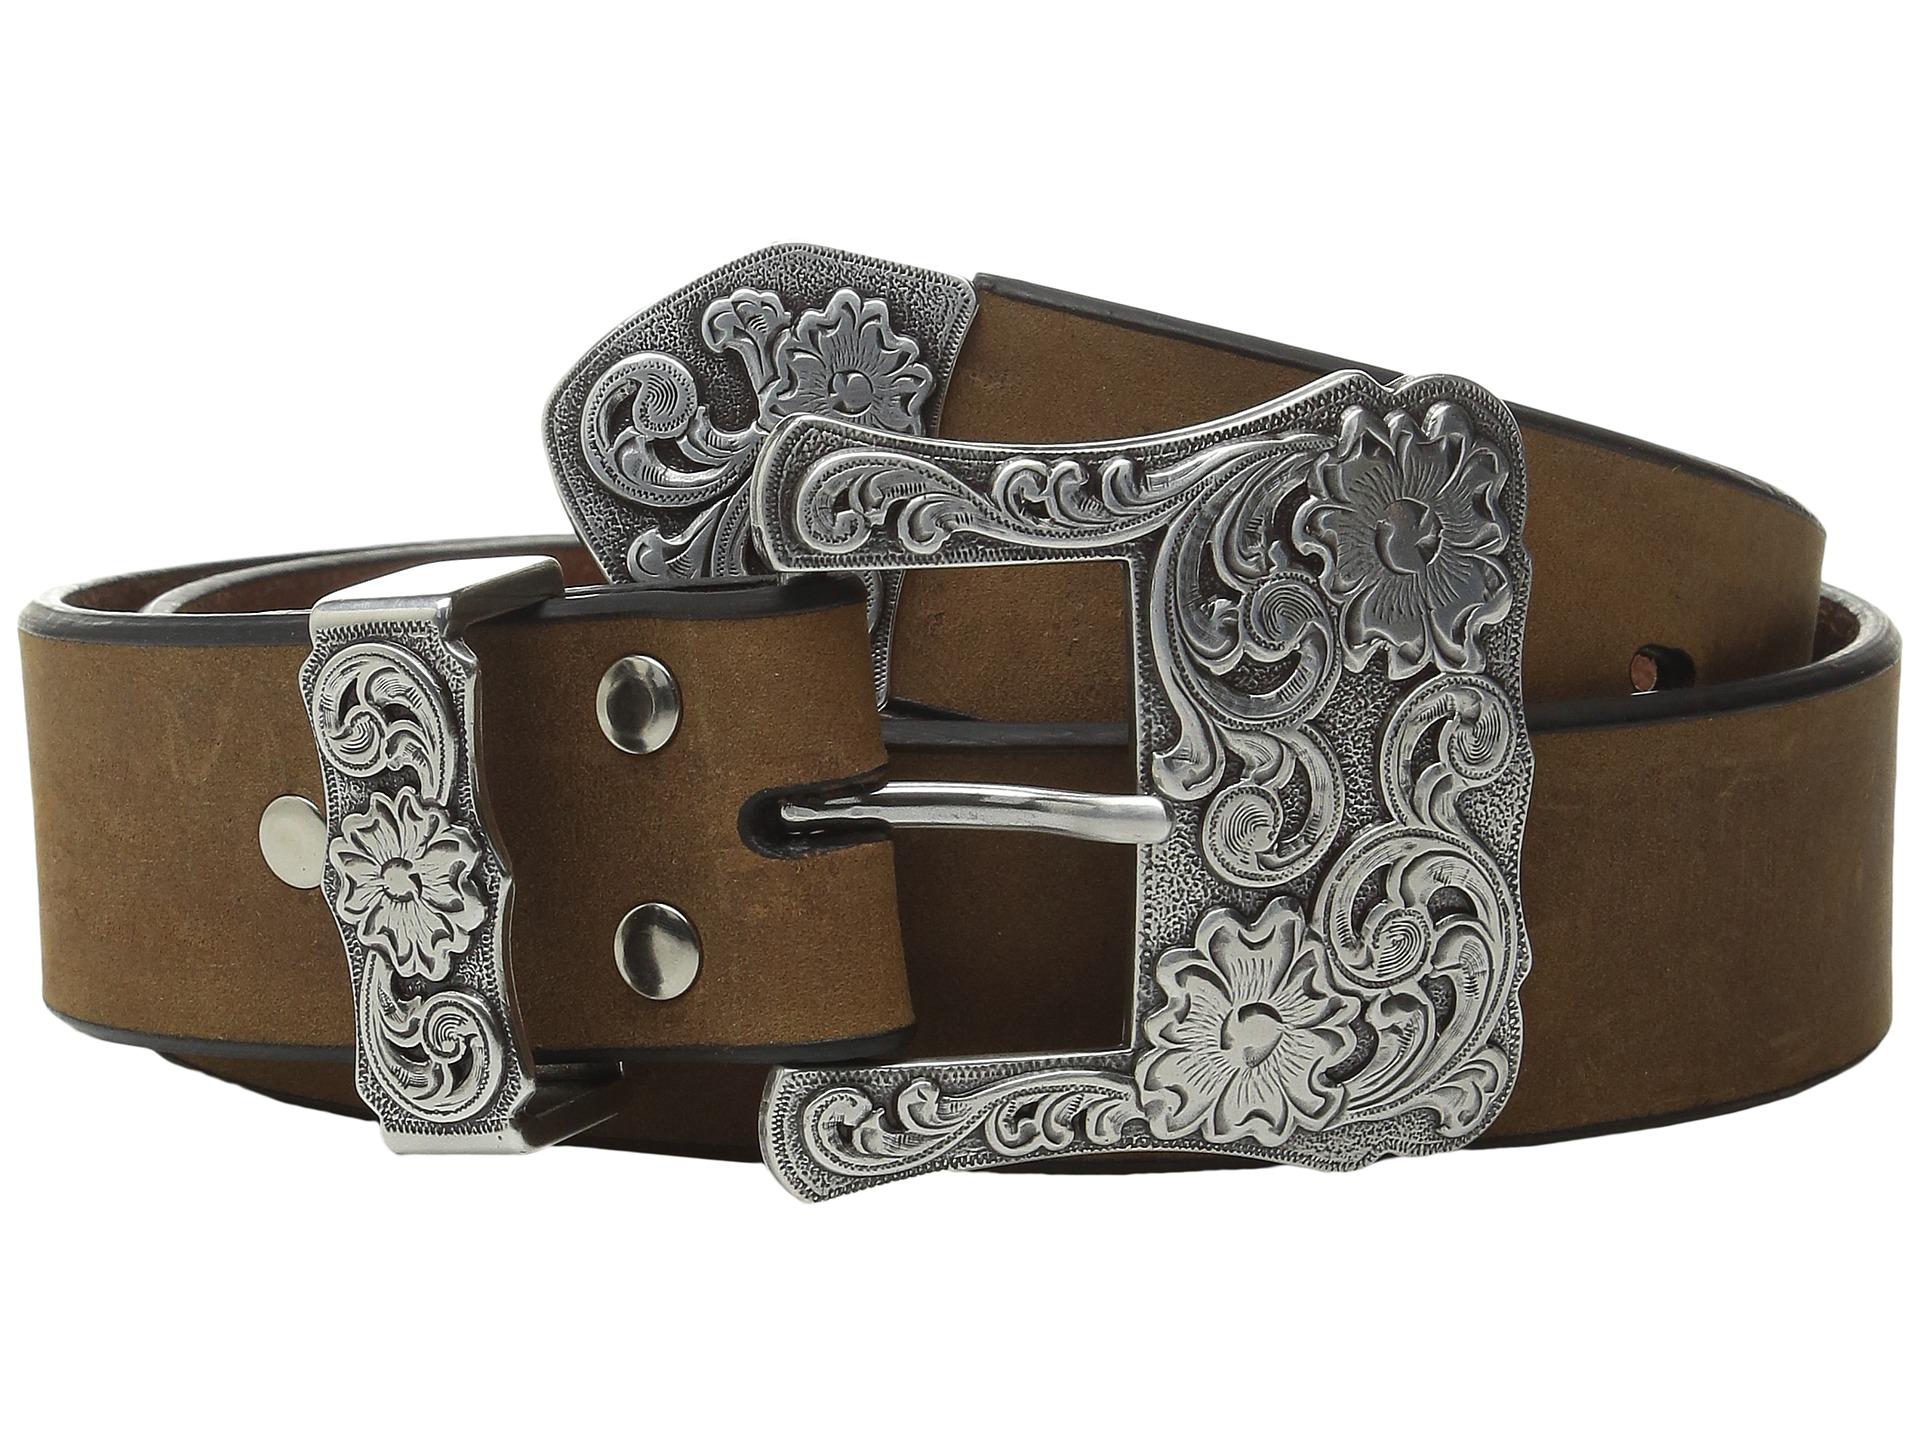 Ladies western fashion belts